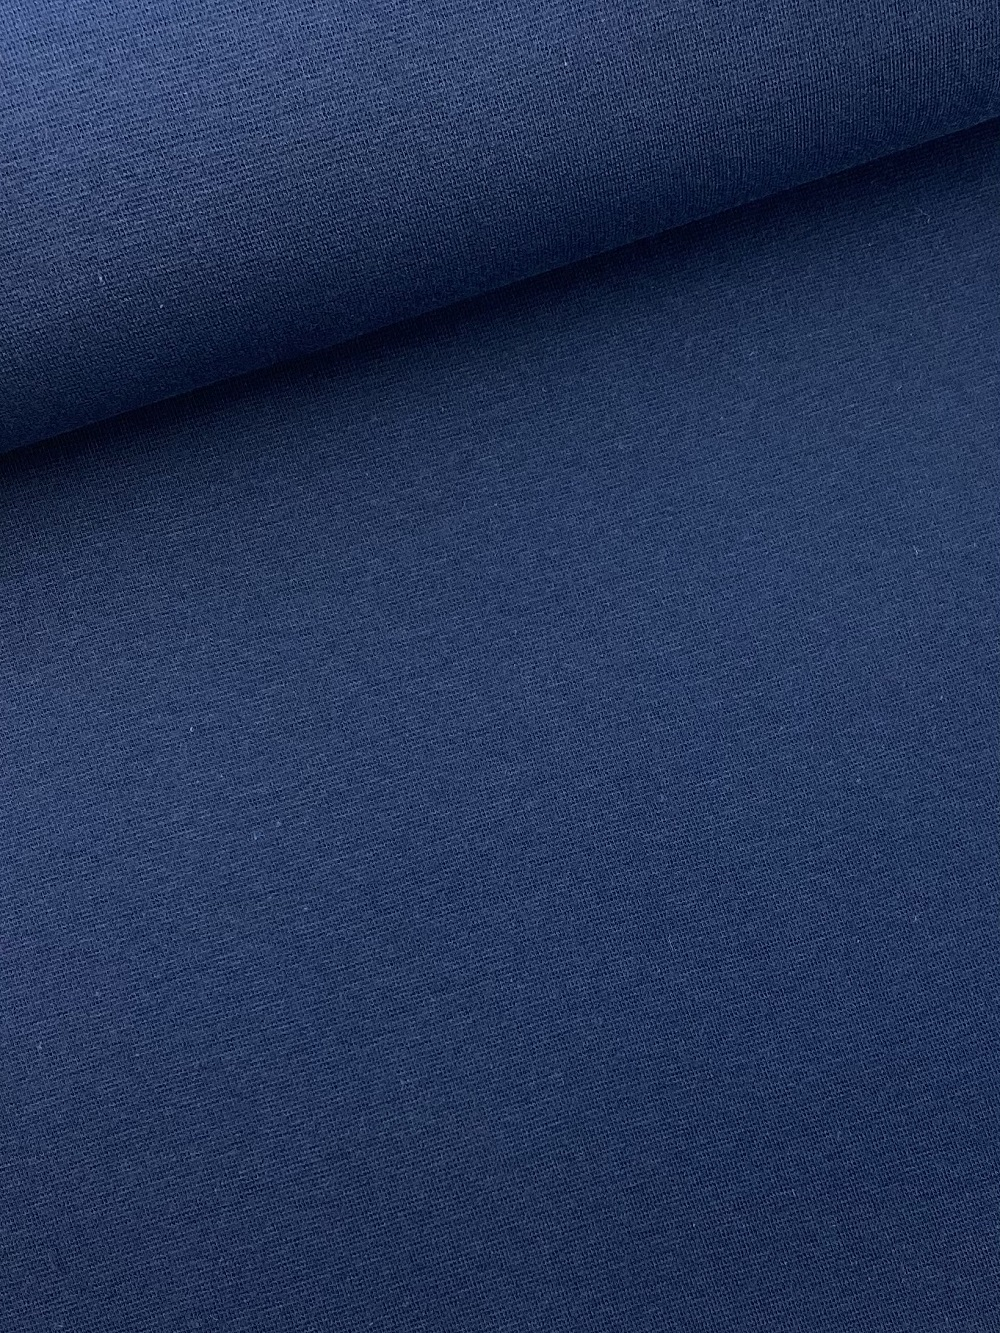 Bündchenware (glatt), marine blau. Art. SW10642